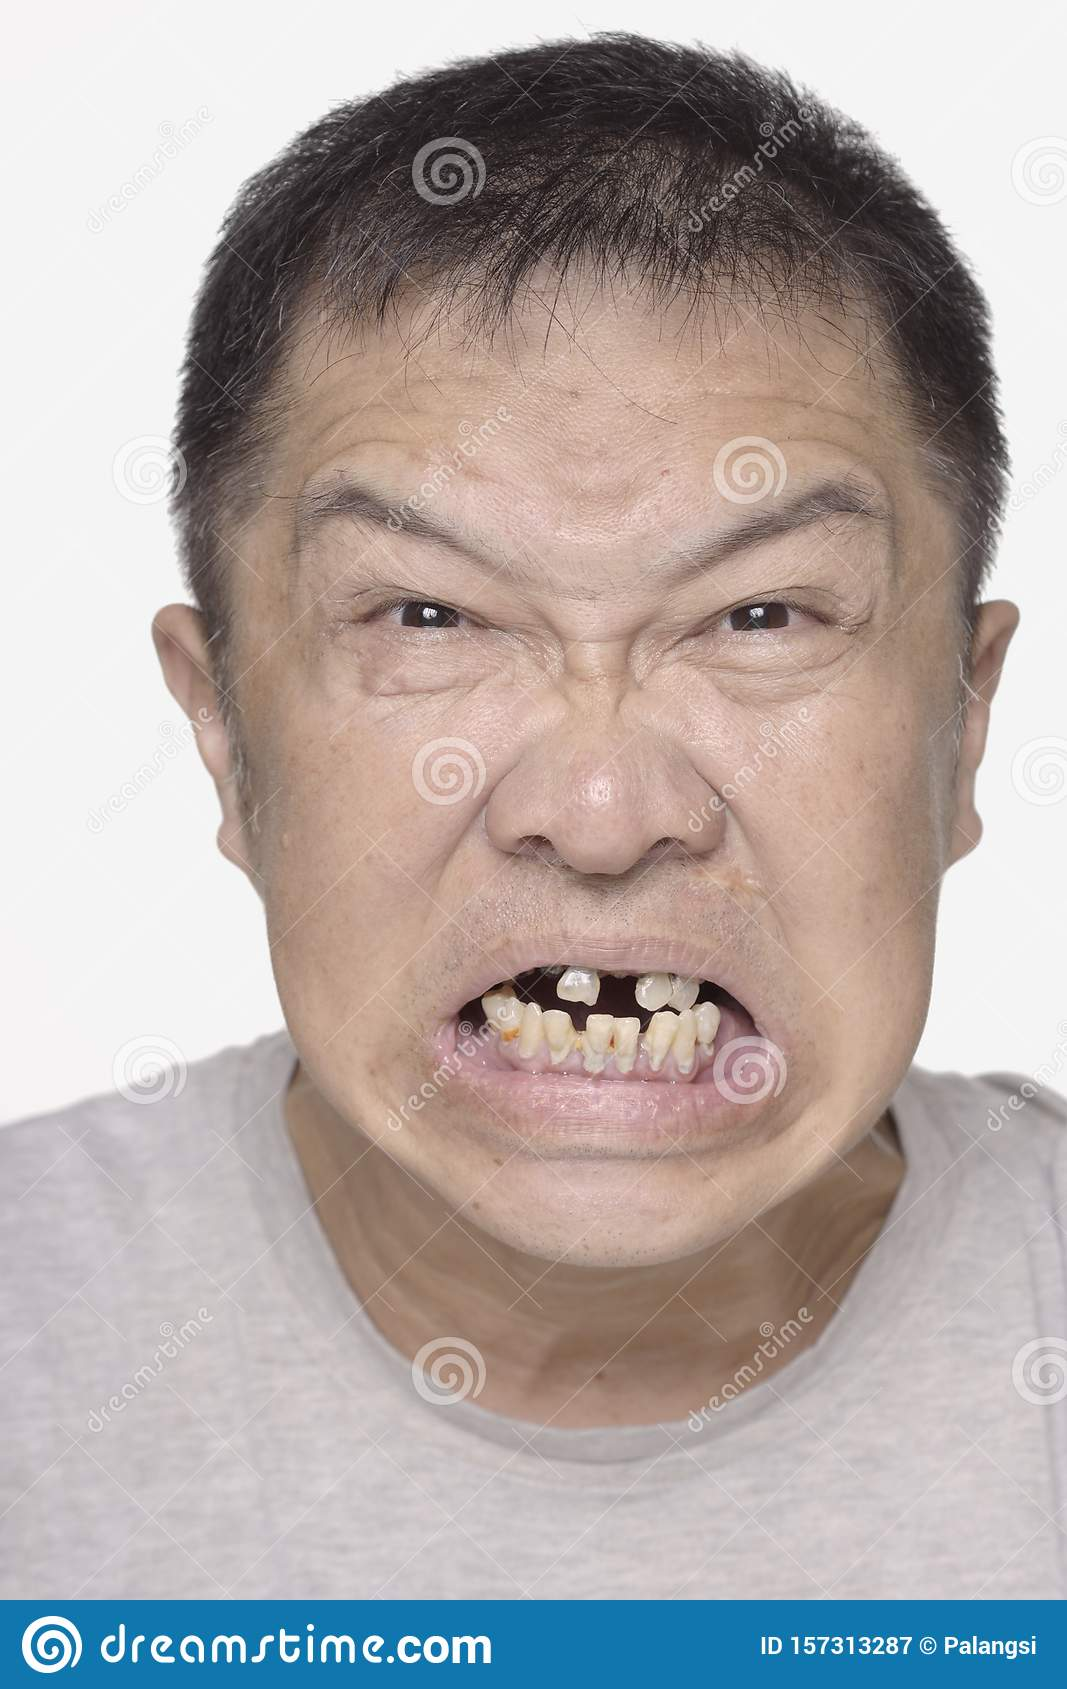 Asian_teeth.jpg